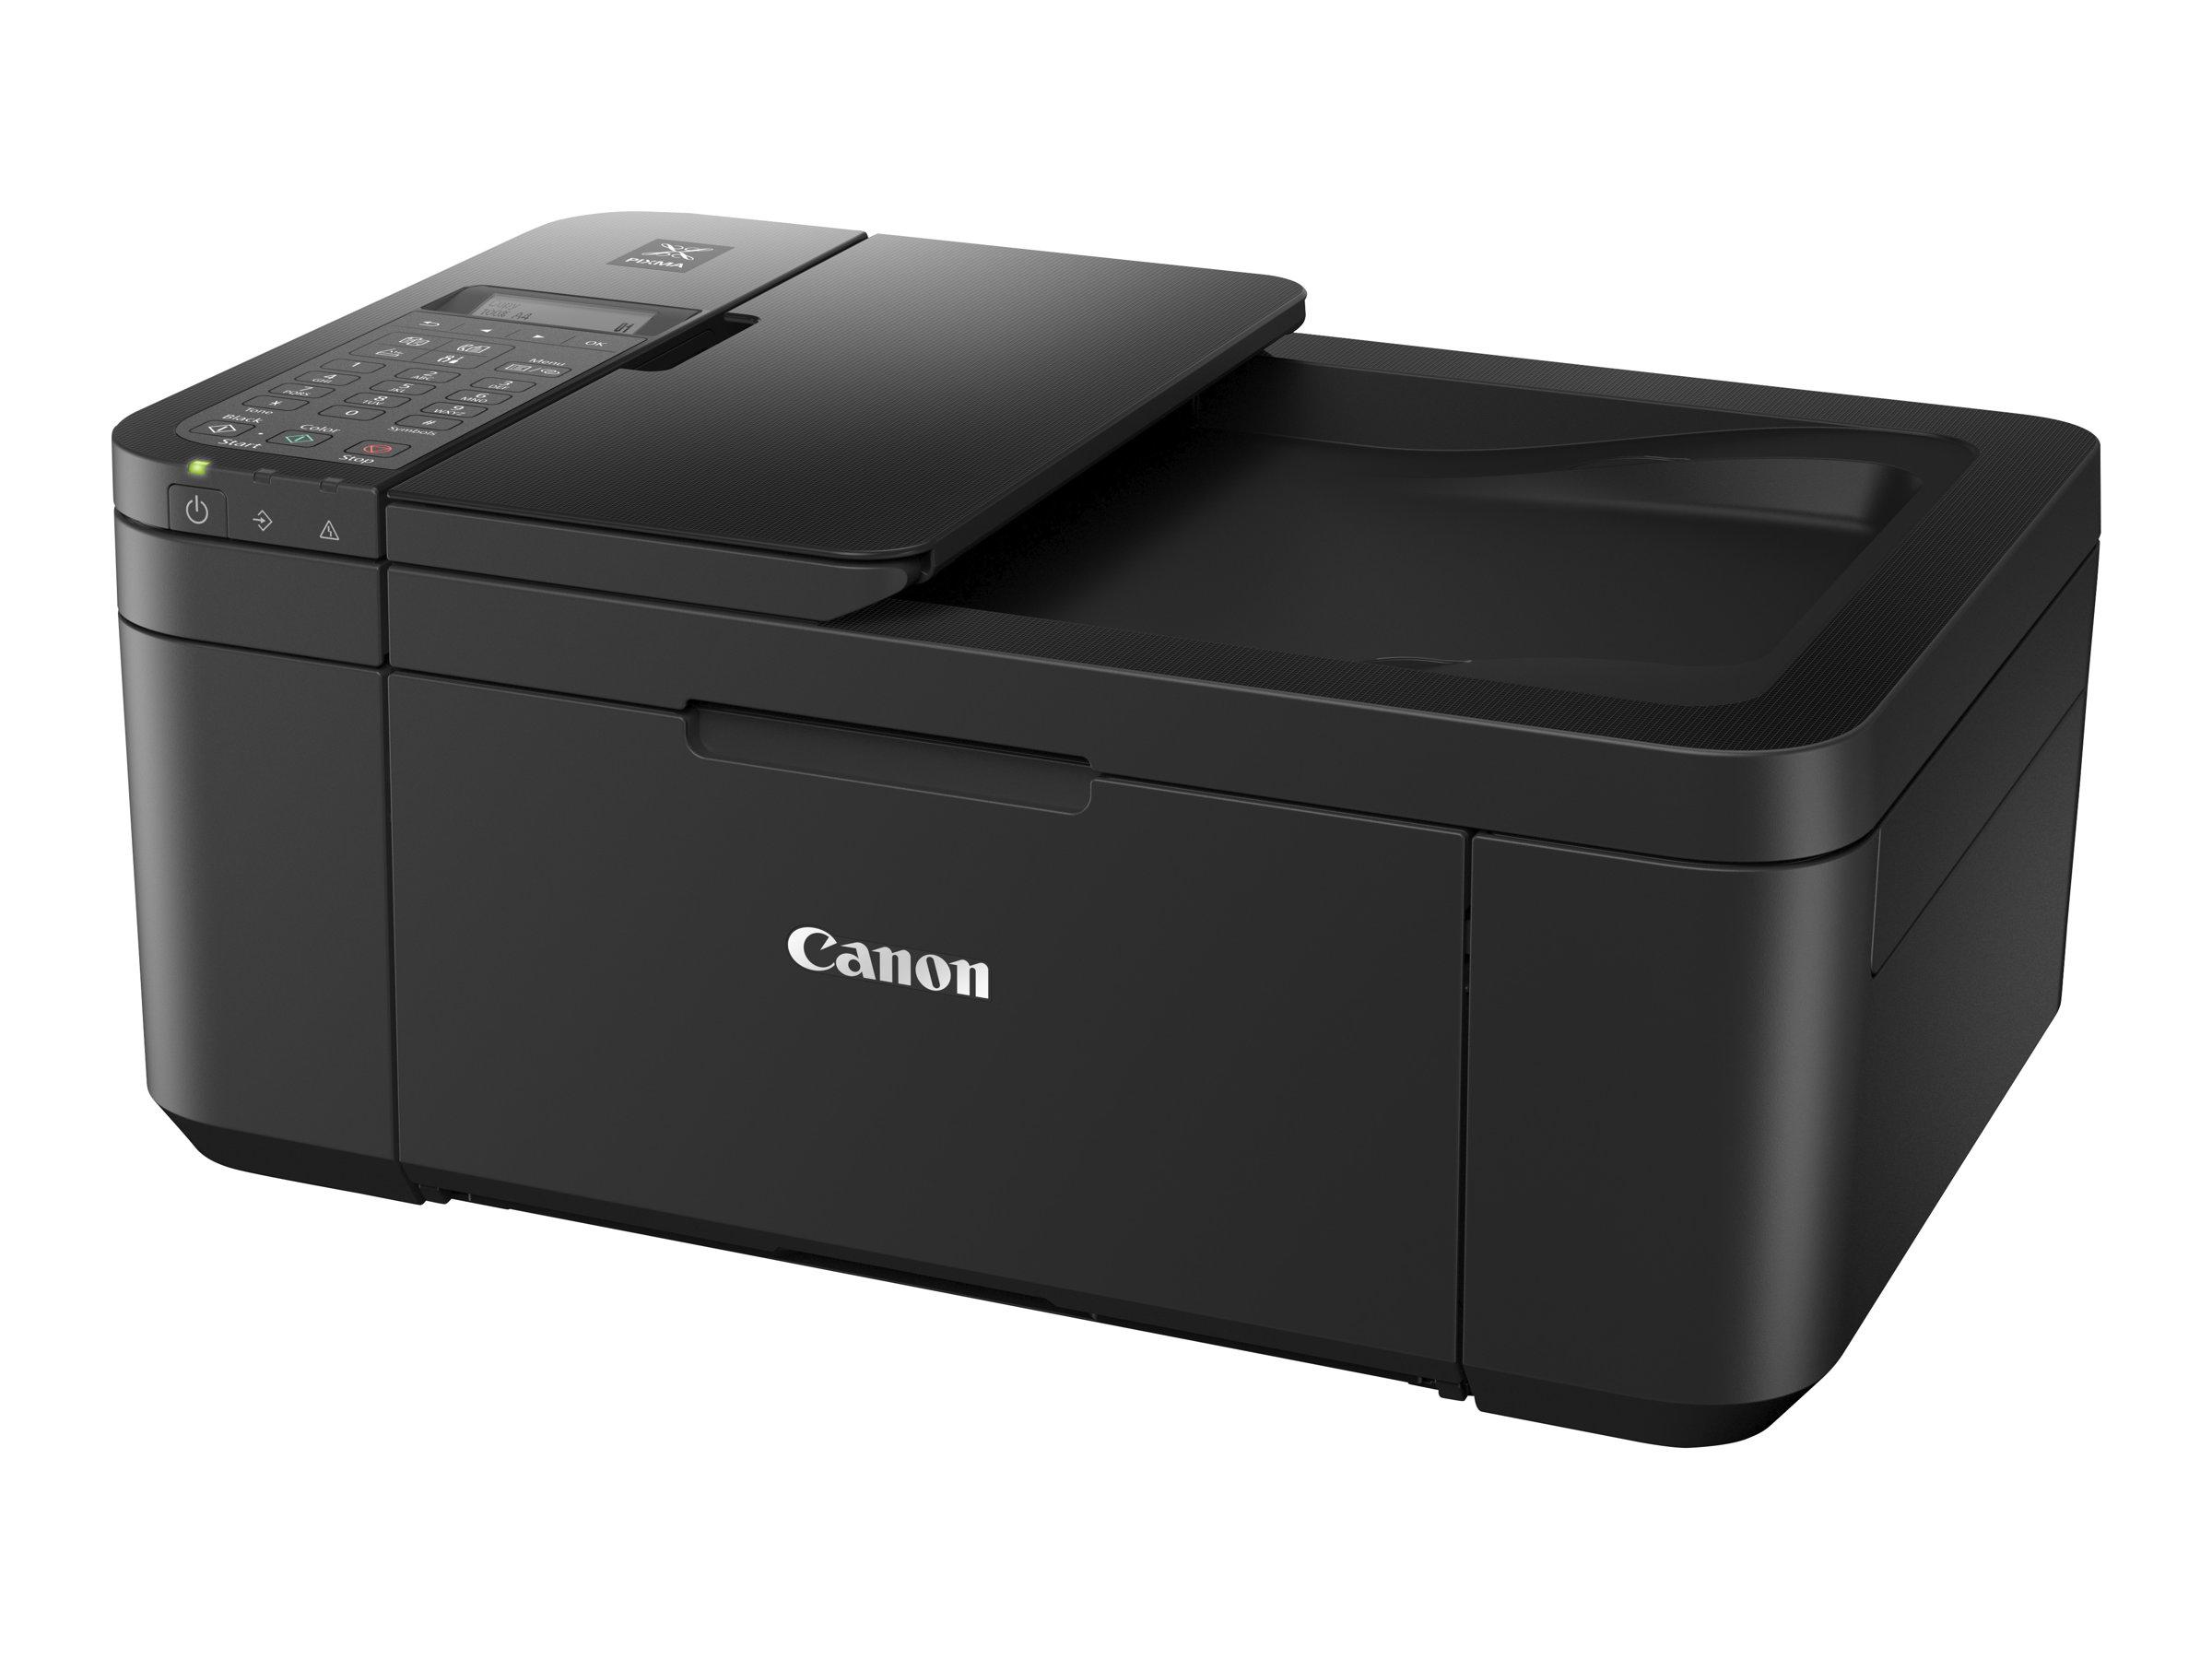 Canon PIXMA TR4550 - Multifunktionsdrucker - Farbe - Tintenstrahl - A4 (210 x 297 mm)